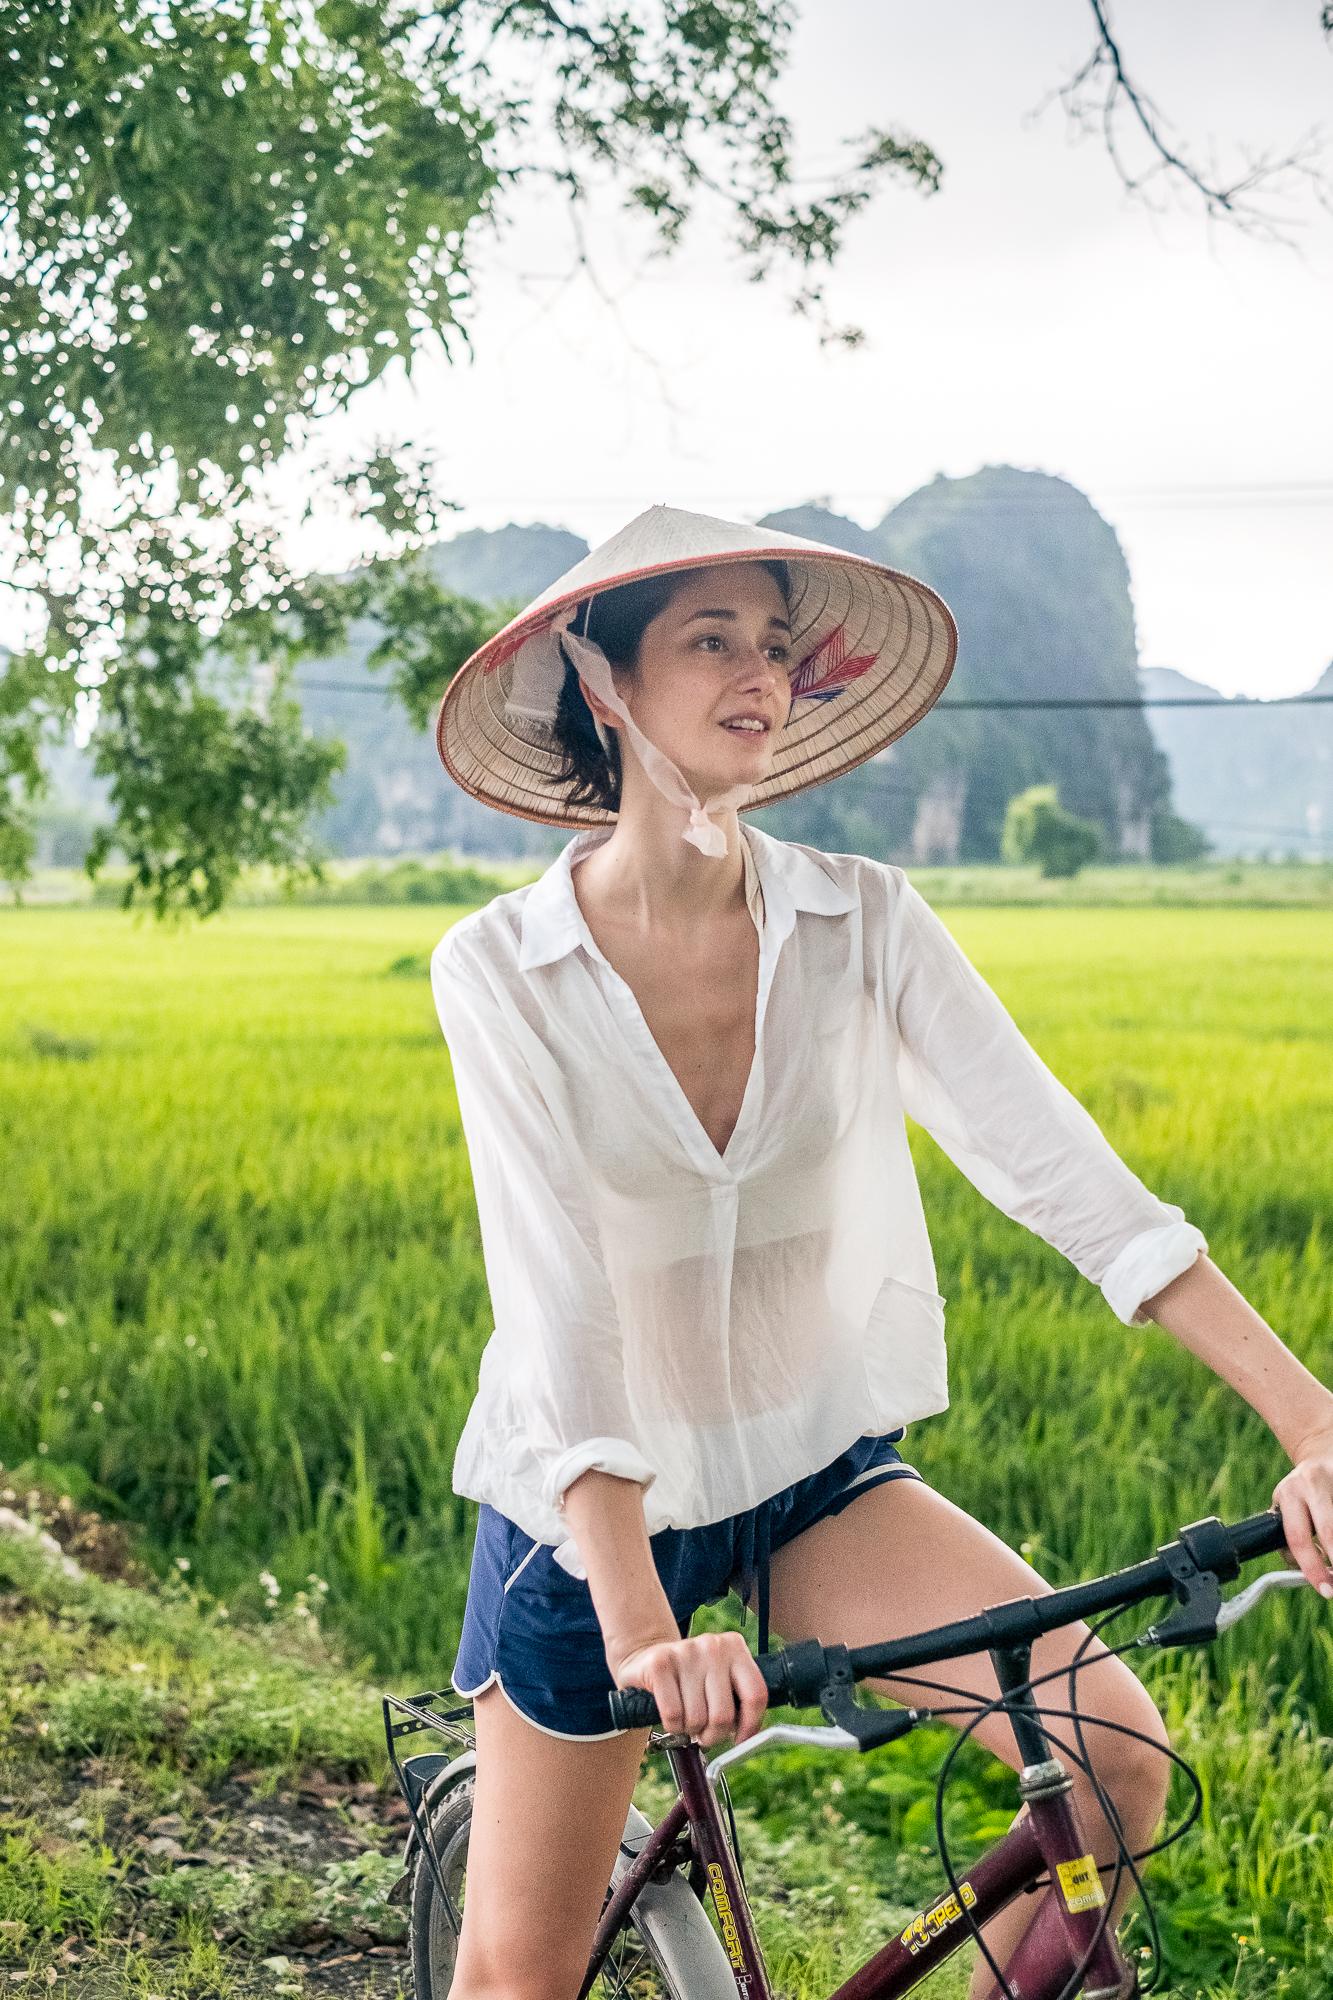 Vietnam_Honeymoon_TheOutsiderBlog_DSCF8773.JPG